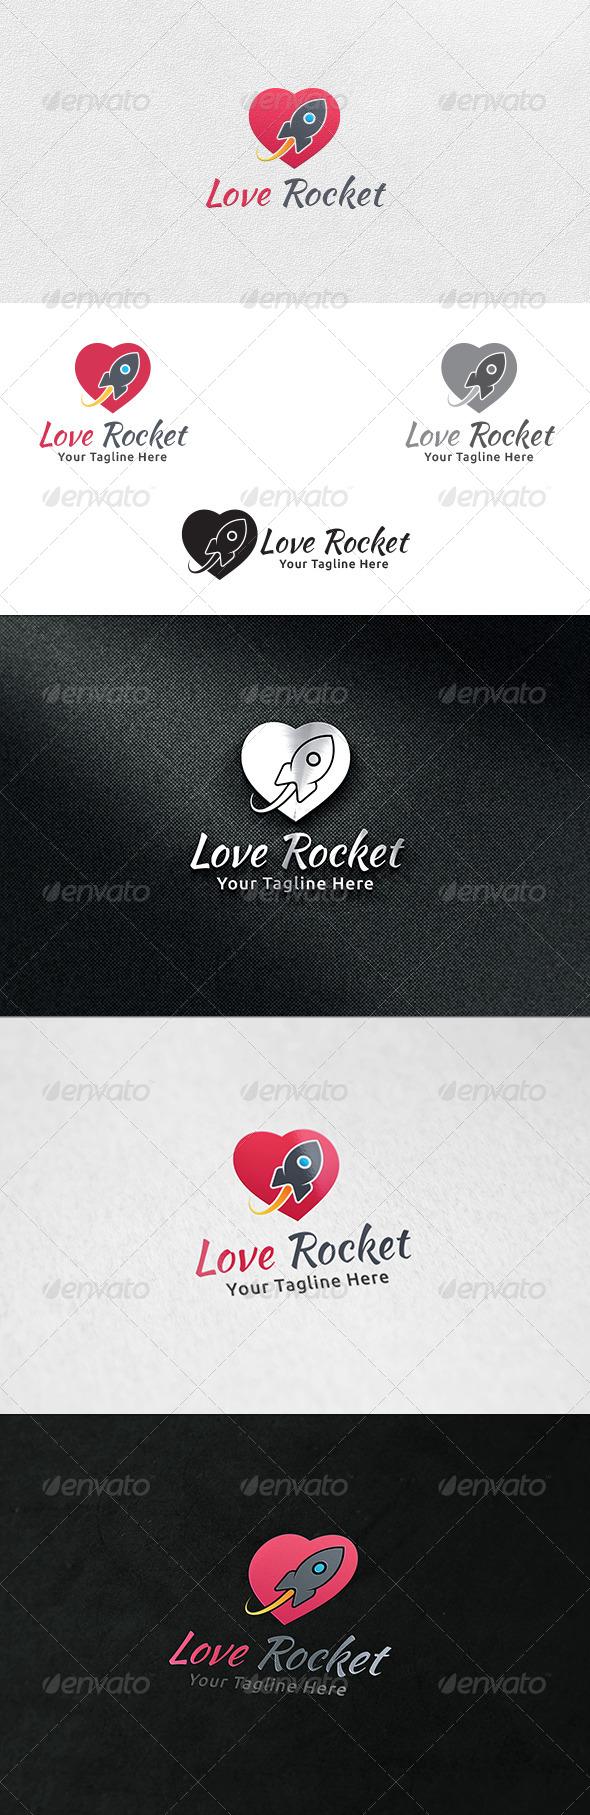 GraphicRiver Love Rocket Logo Template 7272134